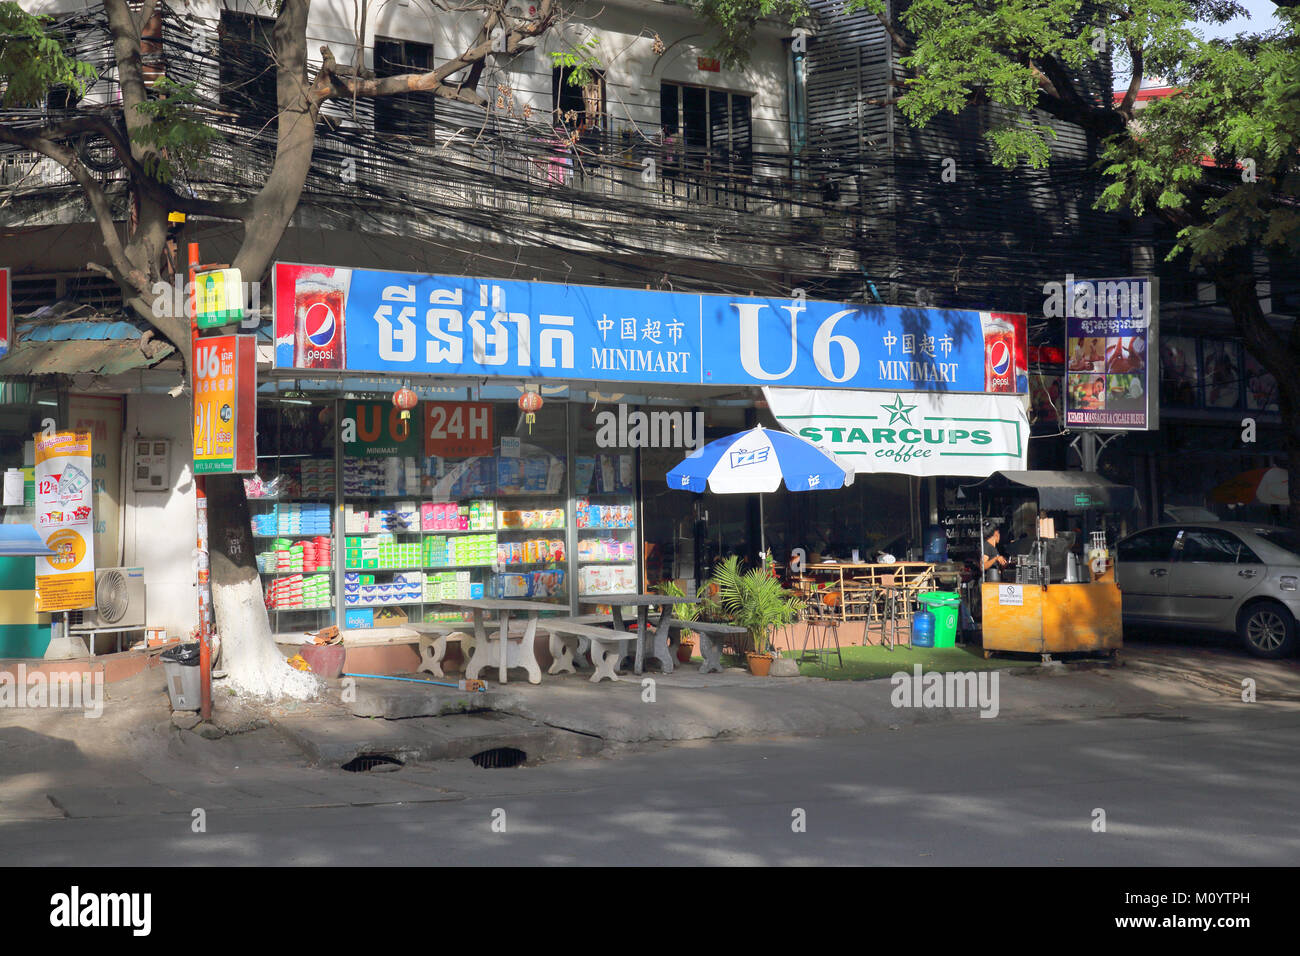 street markets and stalls in phnom penh cambodia Stock Photo